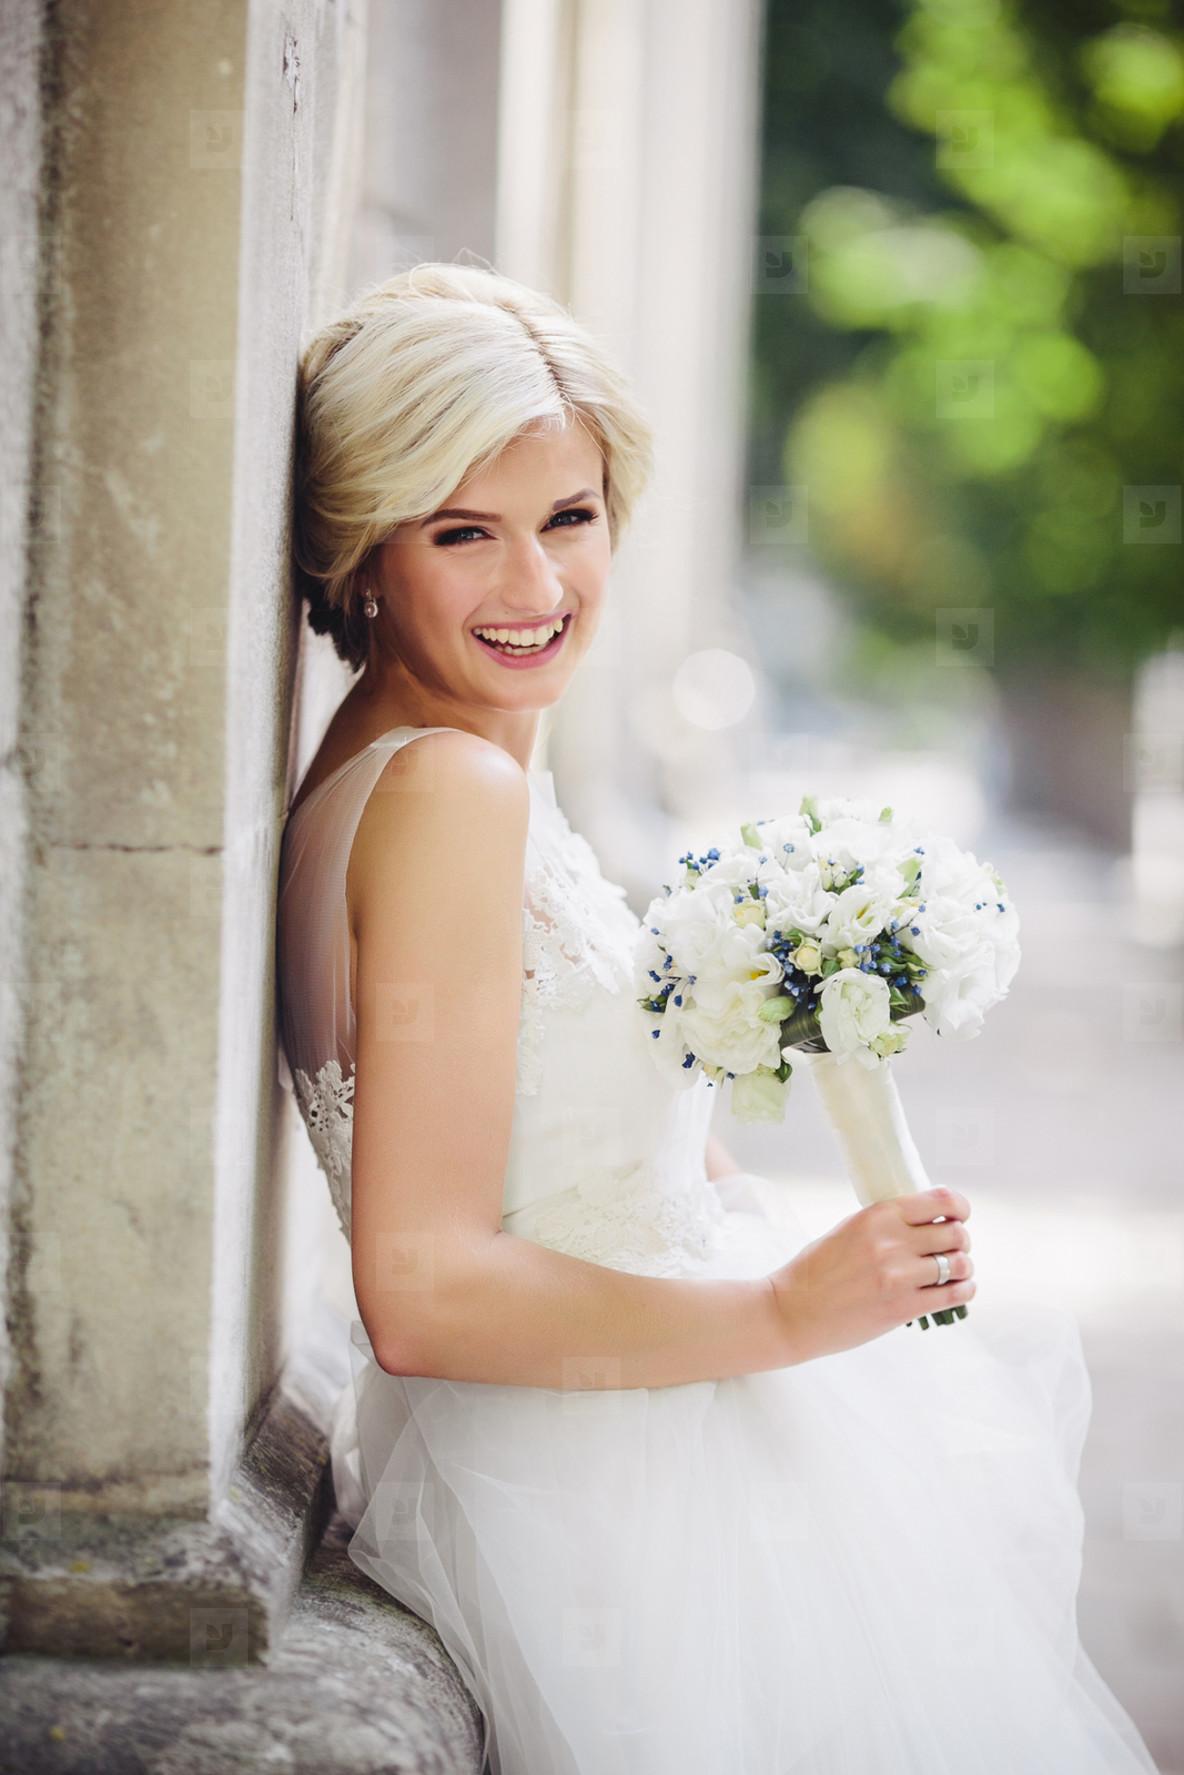 Young beautiful bride posing outdoors